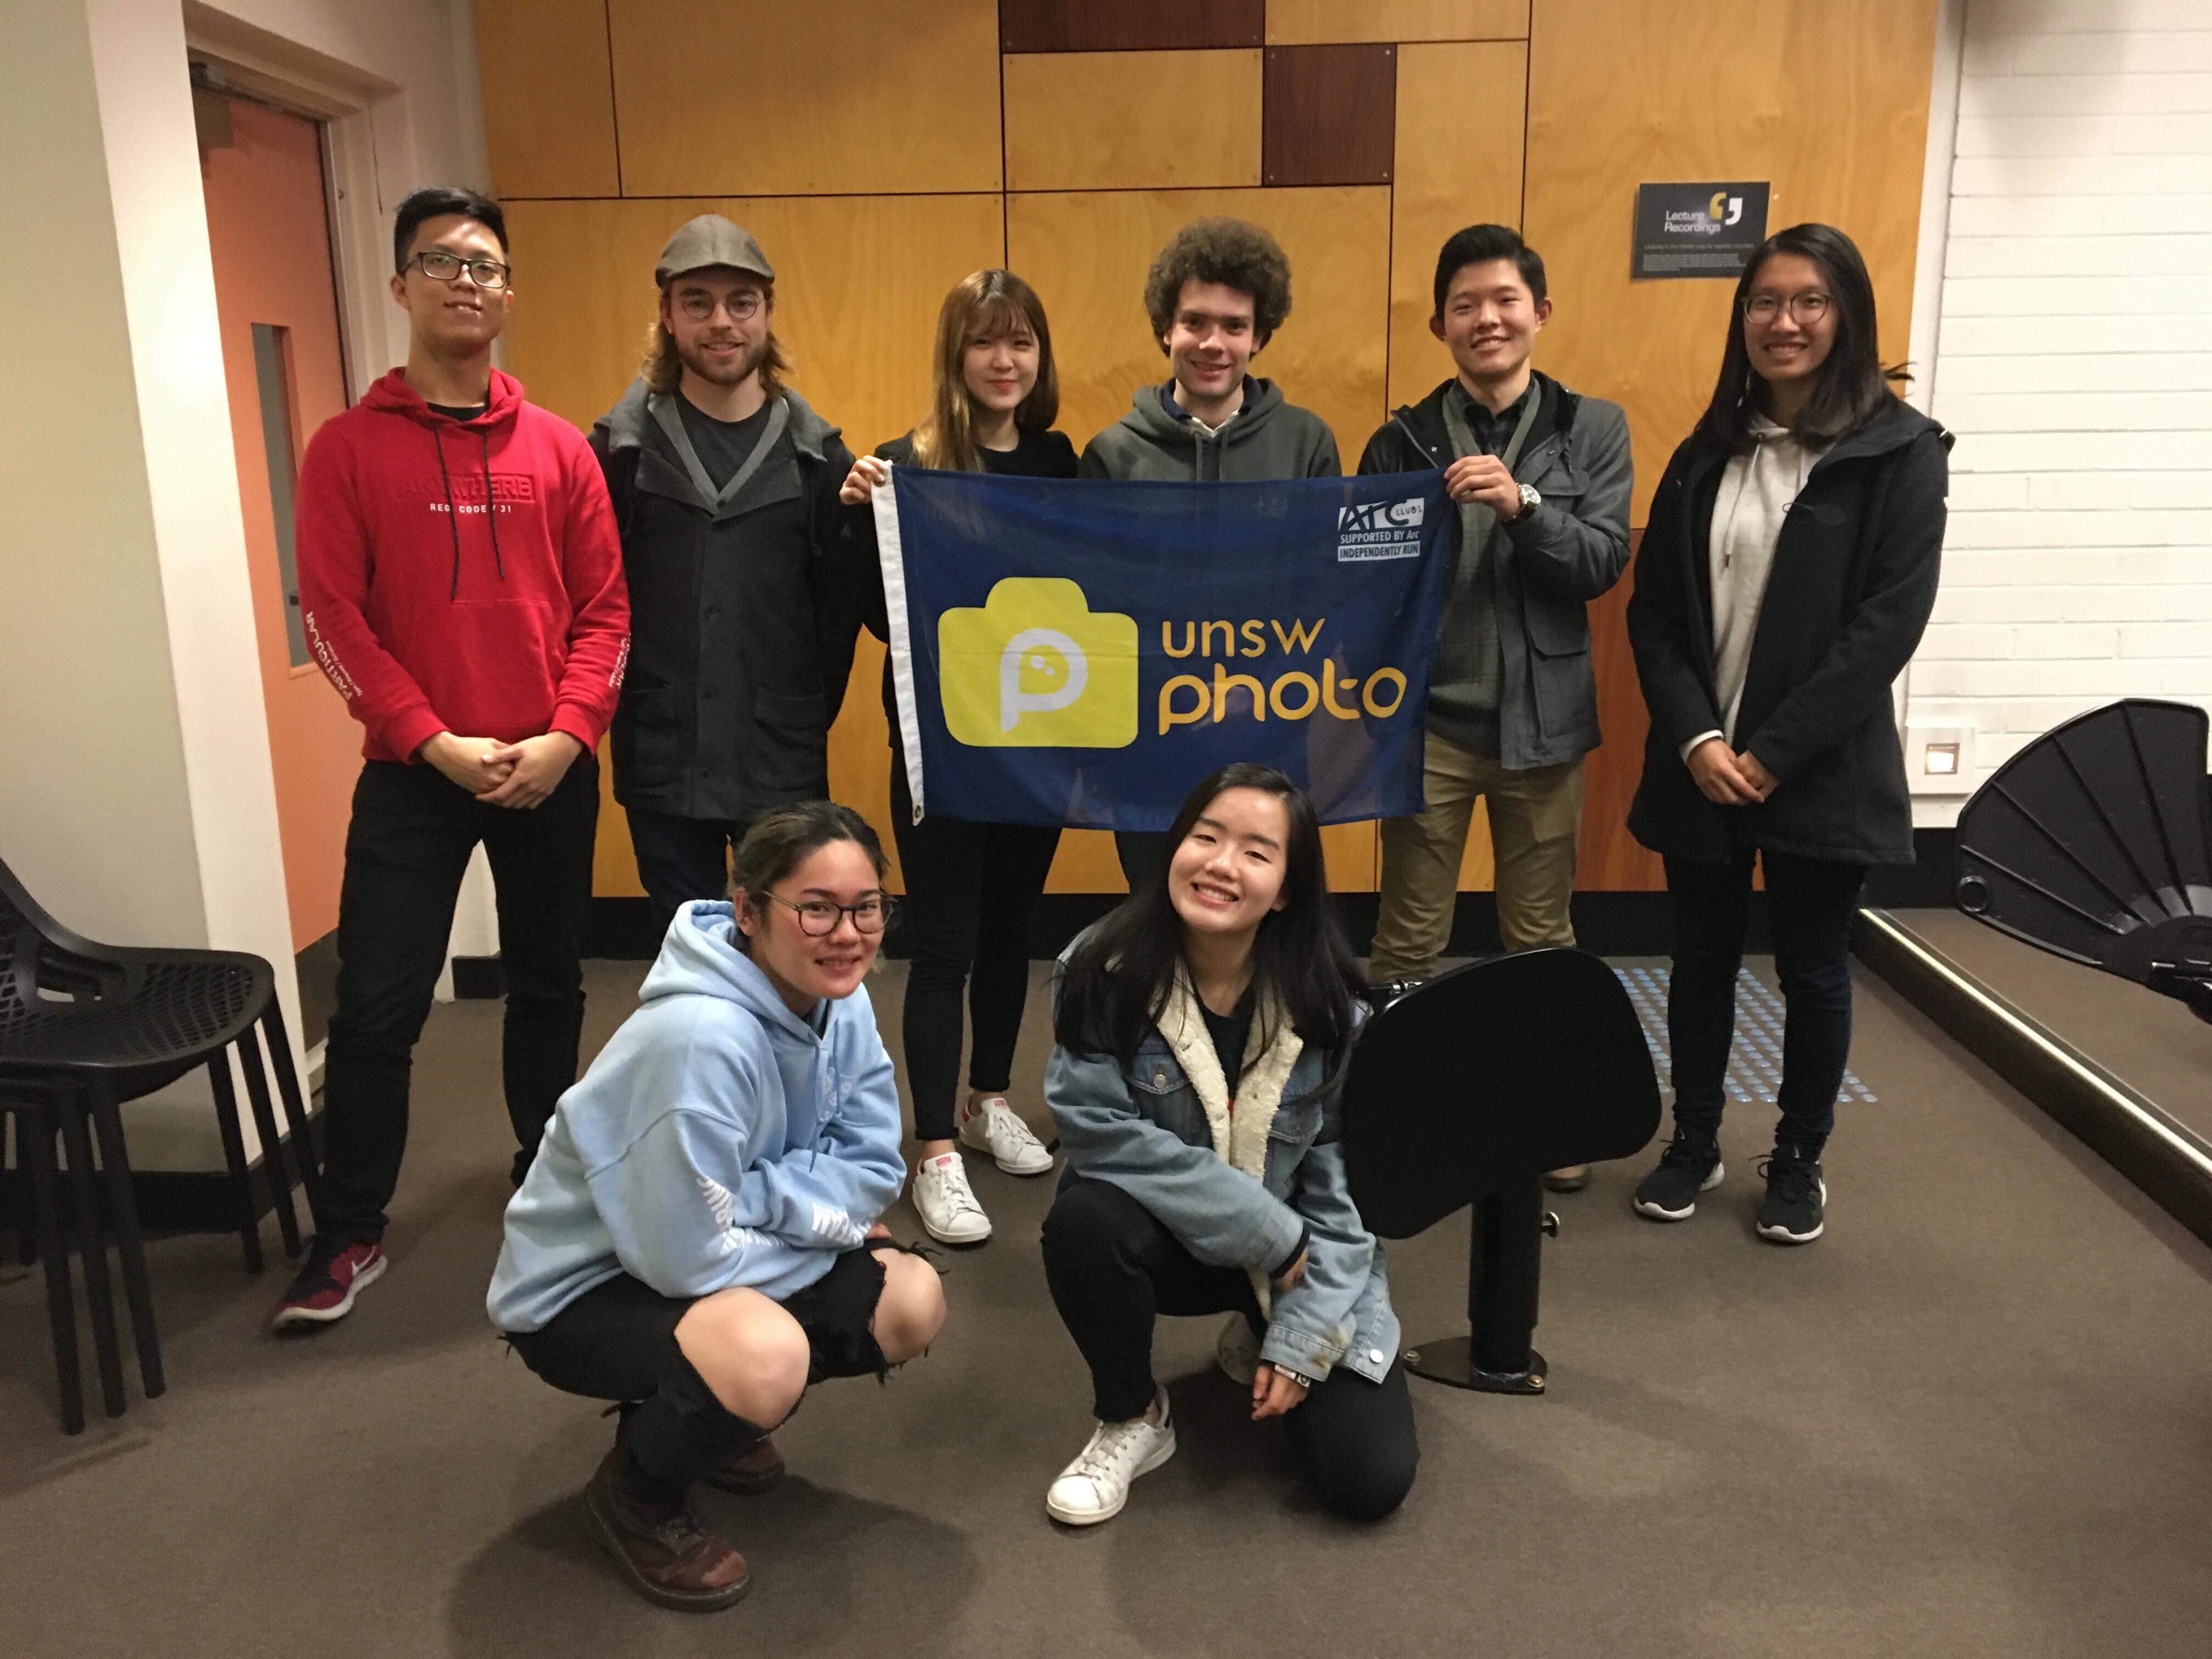 Meet The Team - UNSW PhotoClub